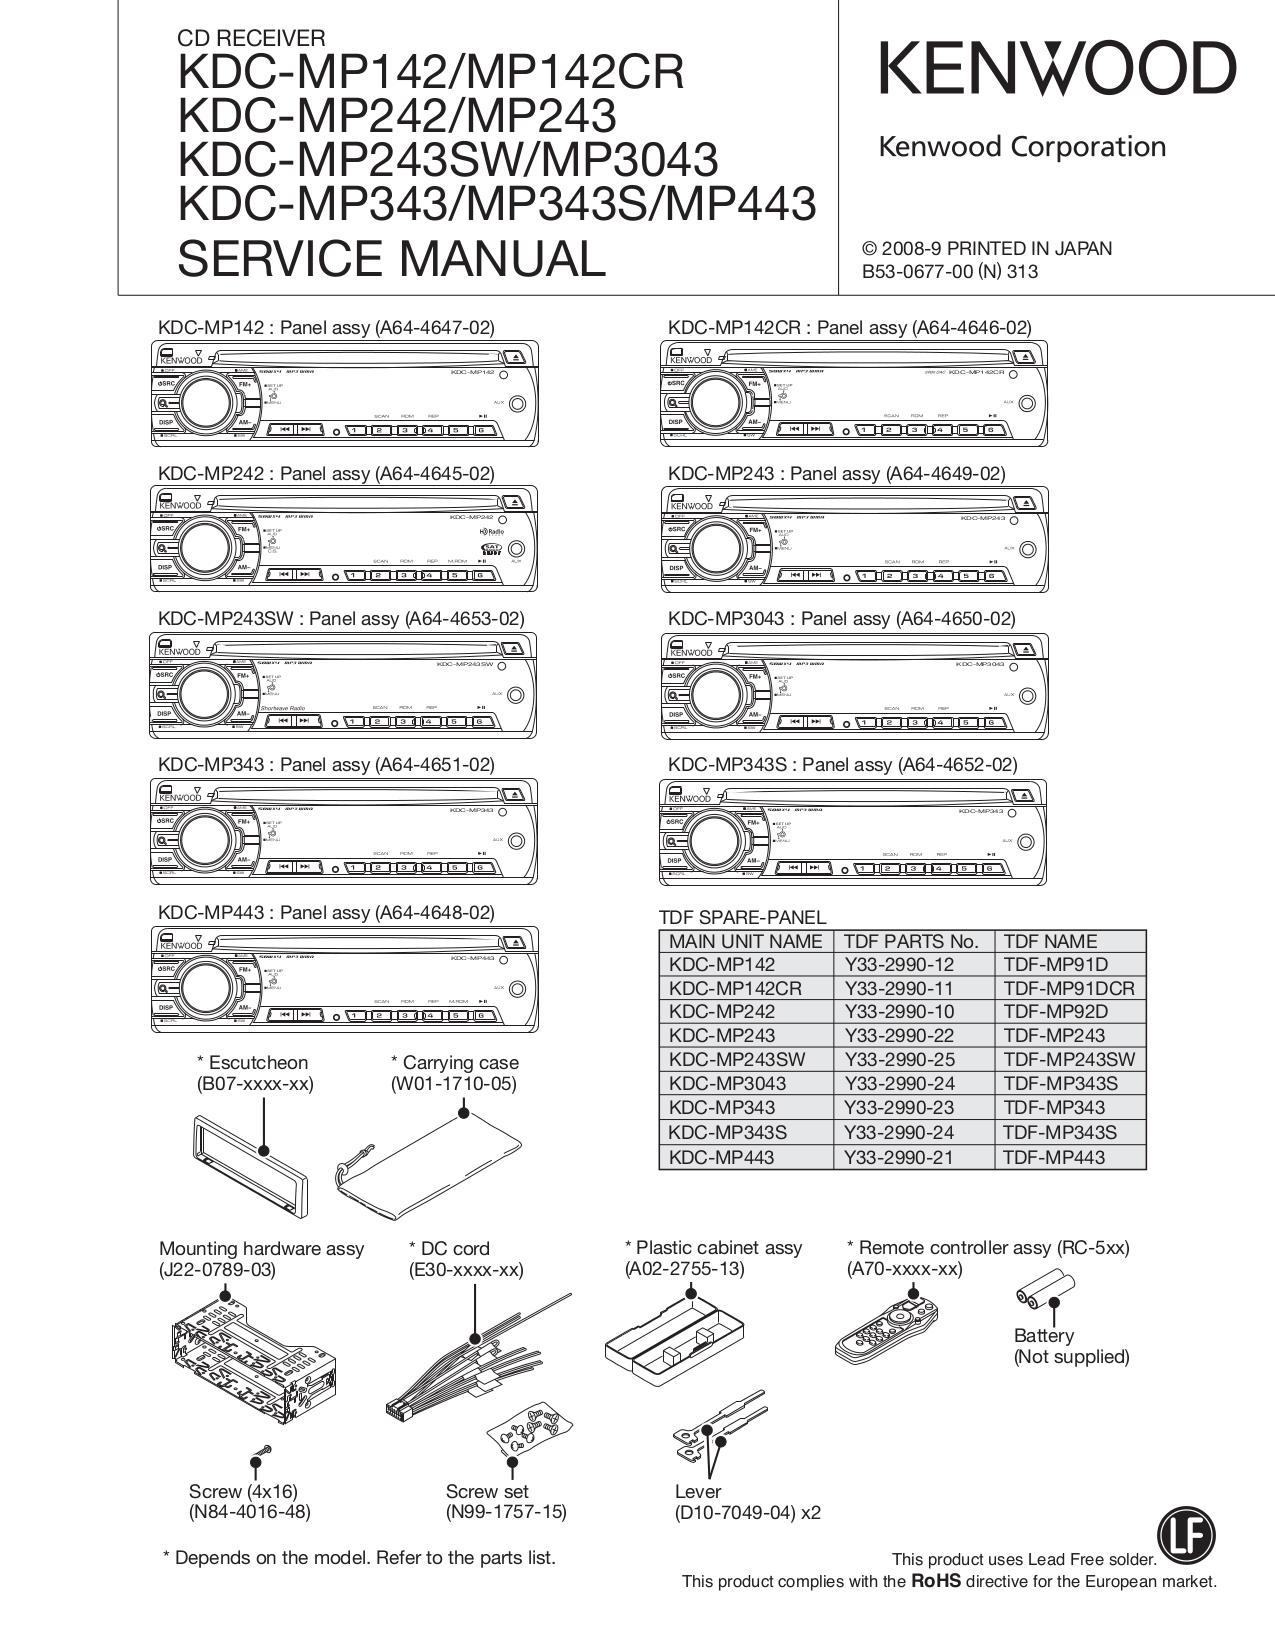 Jl Audio W6v1 Wiring Diagram